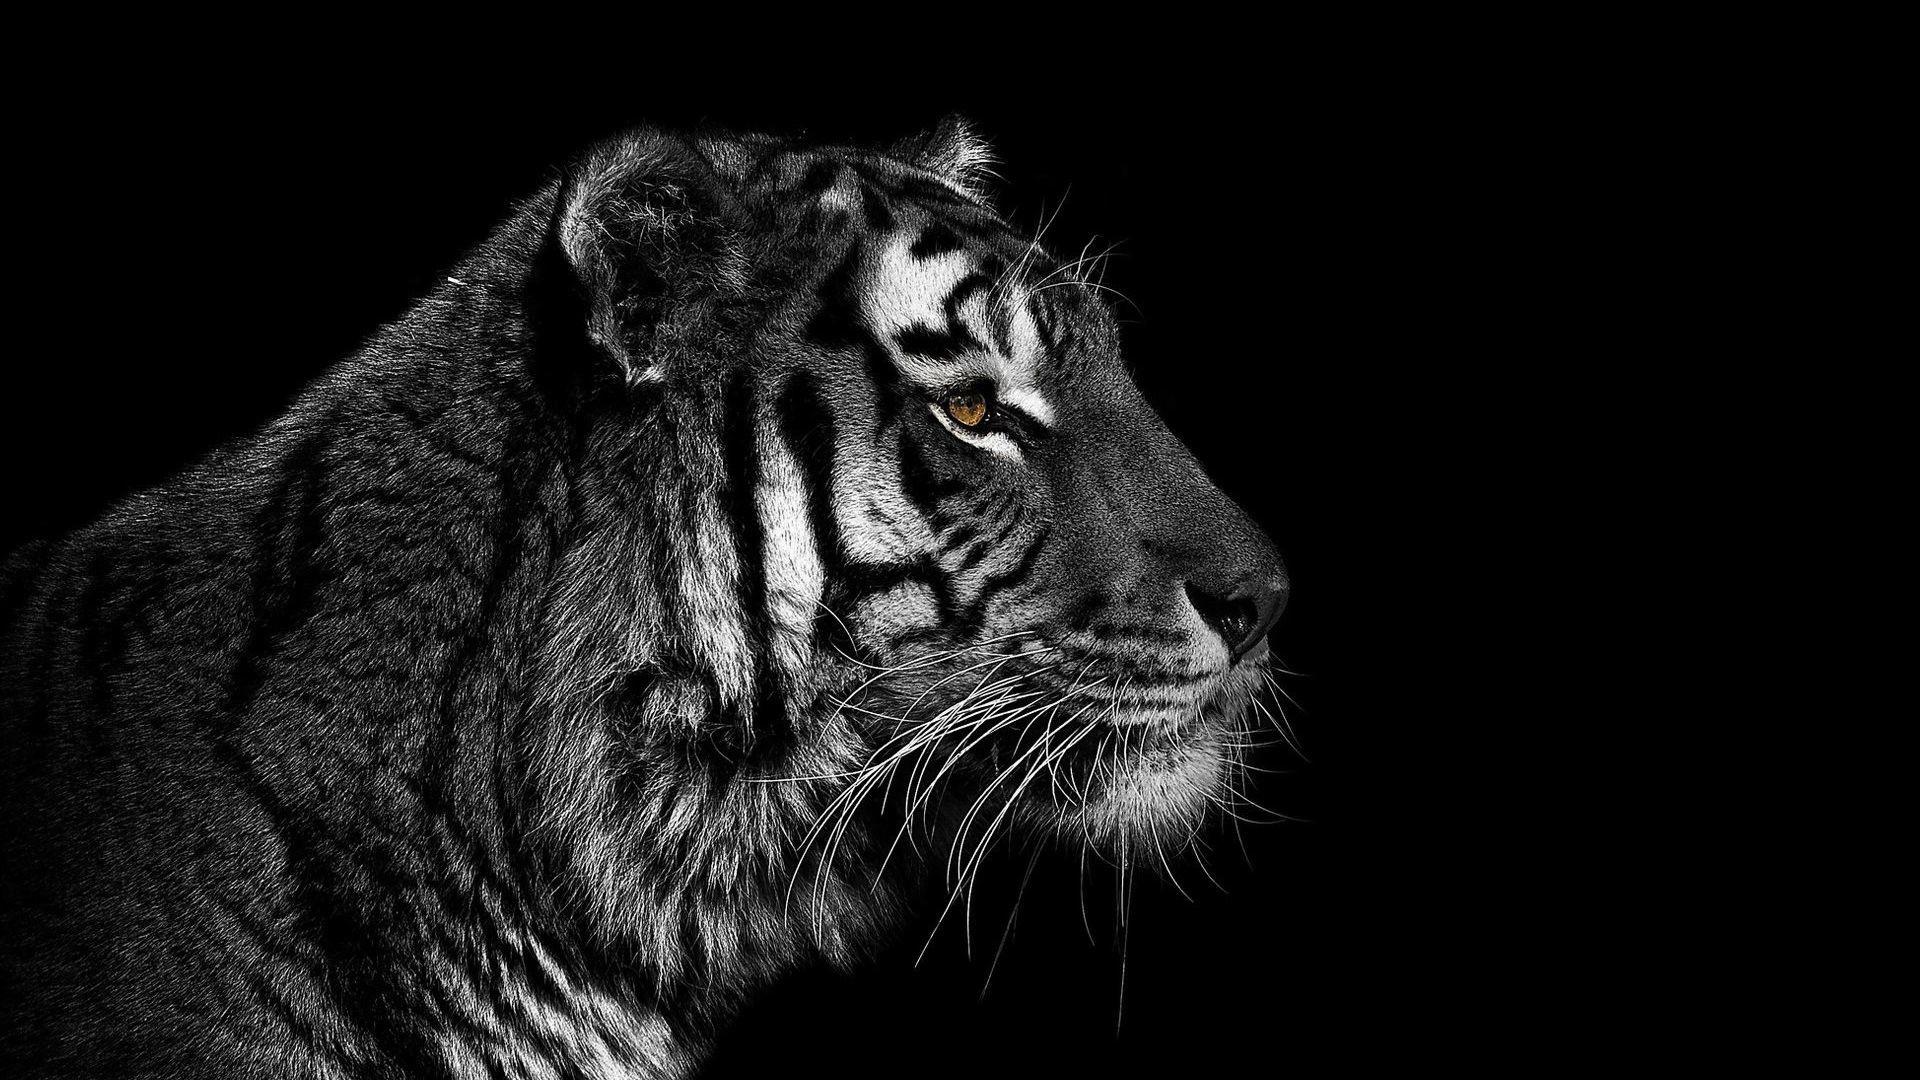 Tiger HD Wallpaper Tiger …